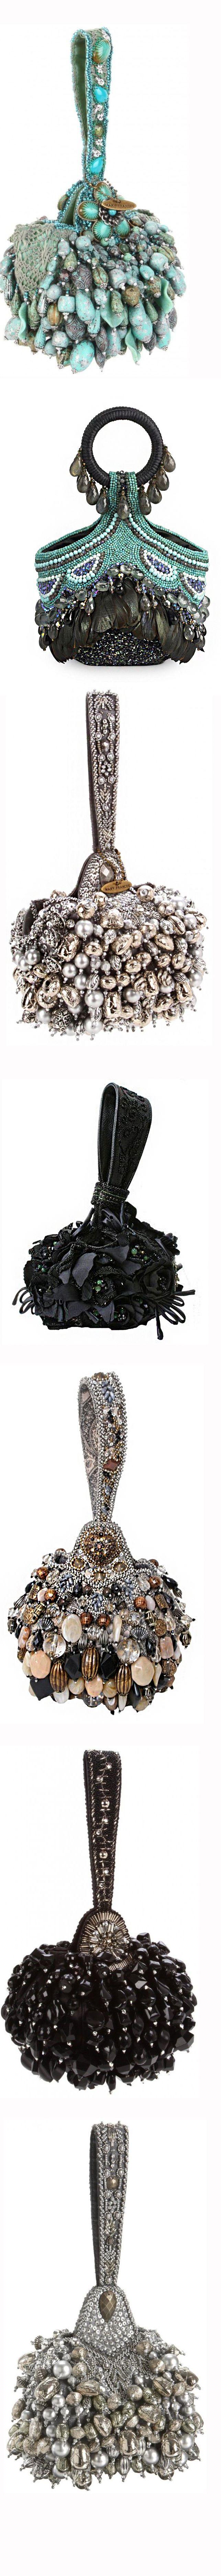 Сумочки-клатчи: безграничная фантазия декора - Ярмарка Мастеров - ручная работа, handmade